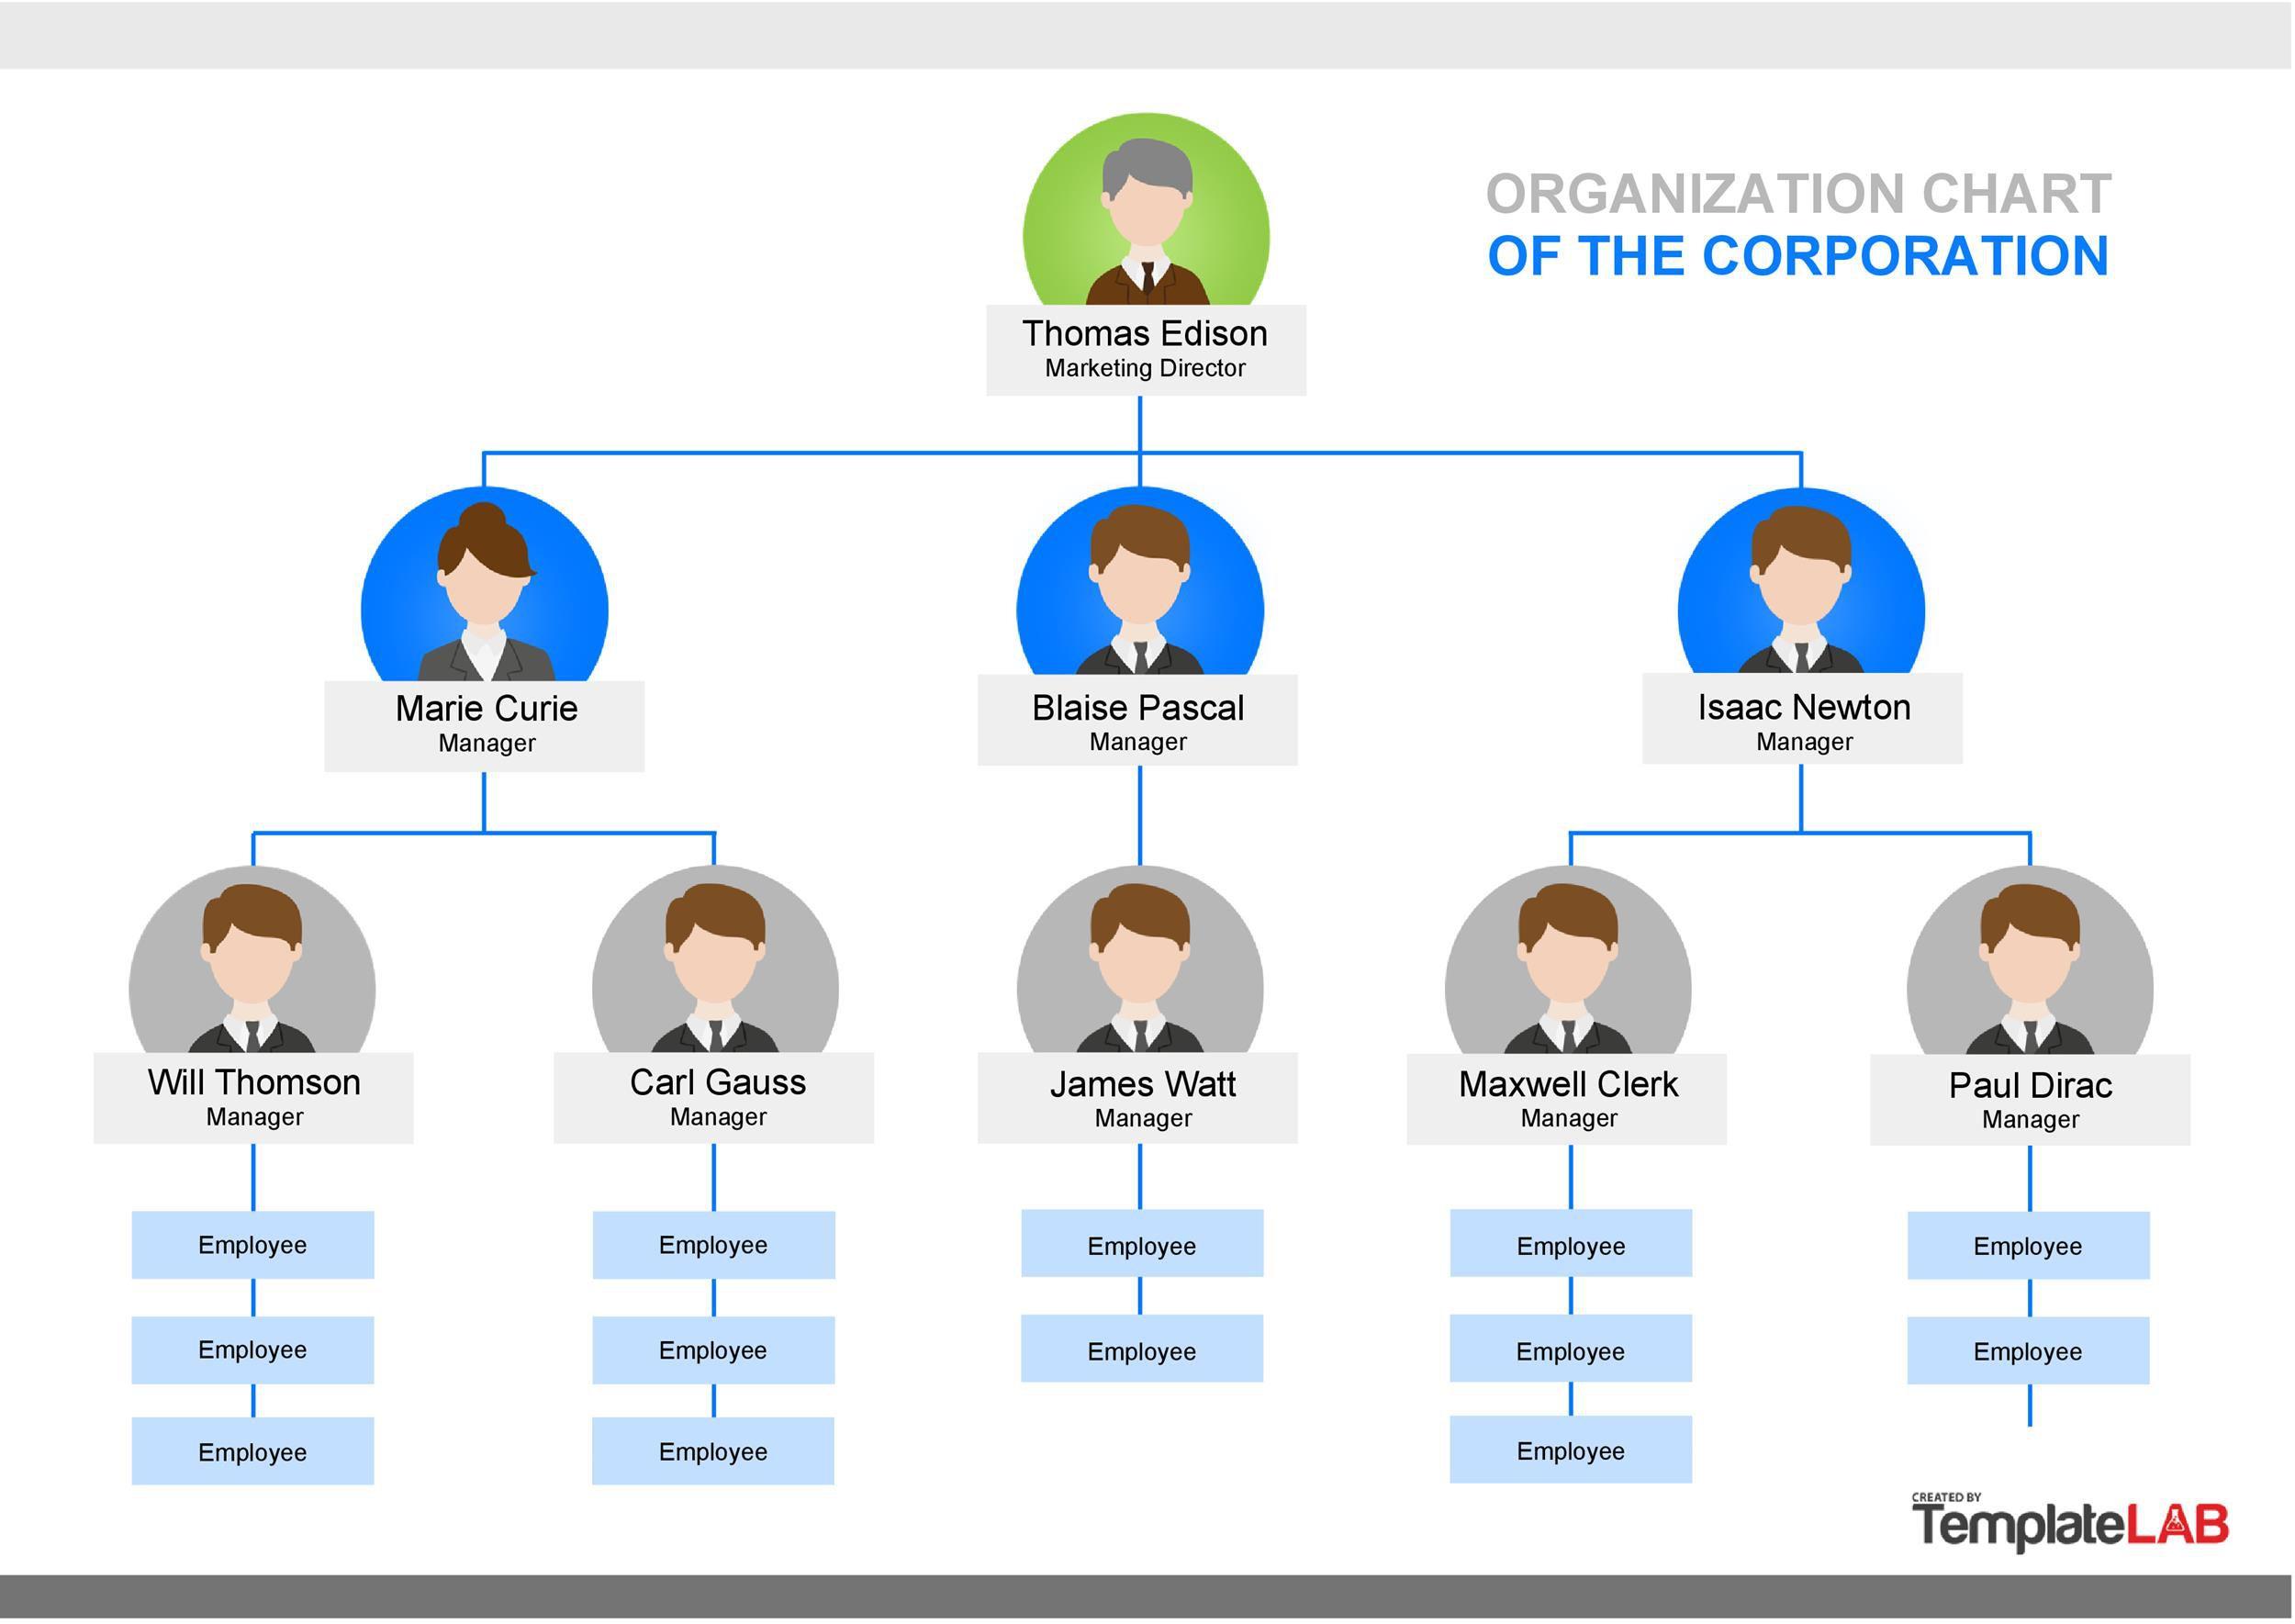 004 Shocking Microsoft Word Organization Chart Template Inspiration  Organizational Download 2007Full